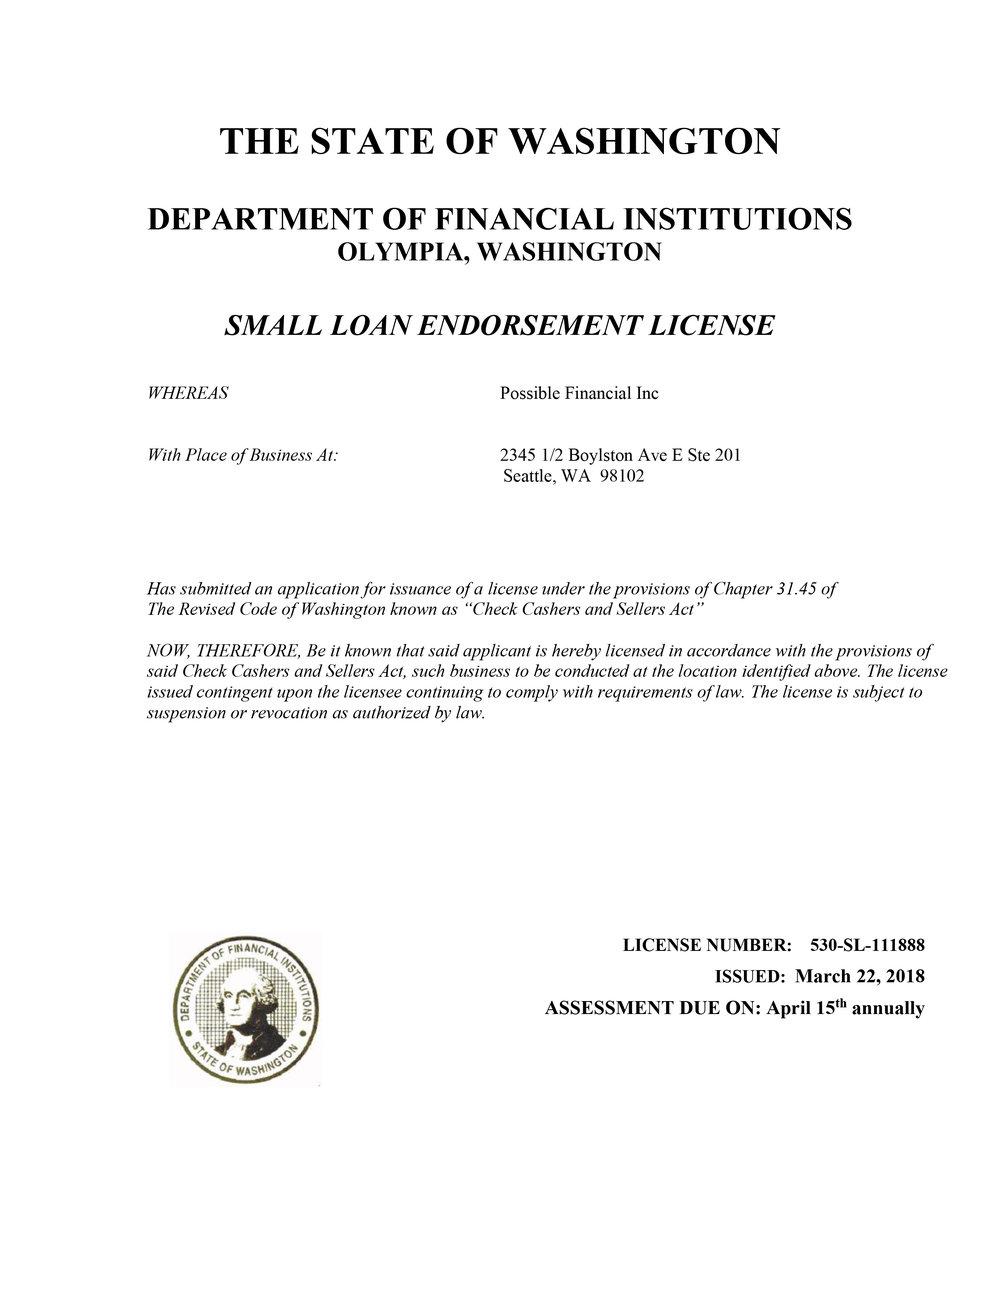 Washington lending license for Possible Finance